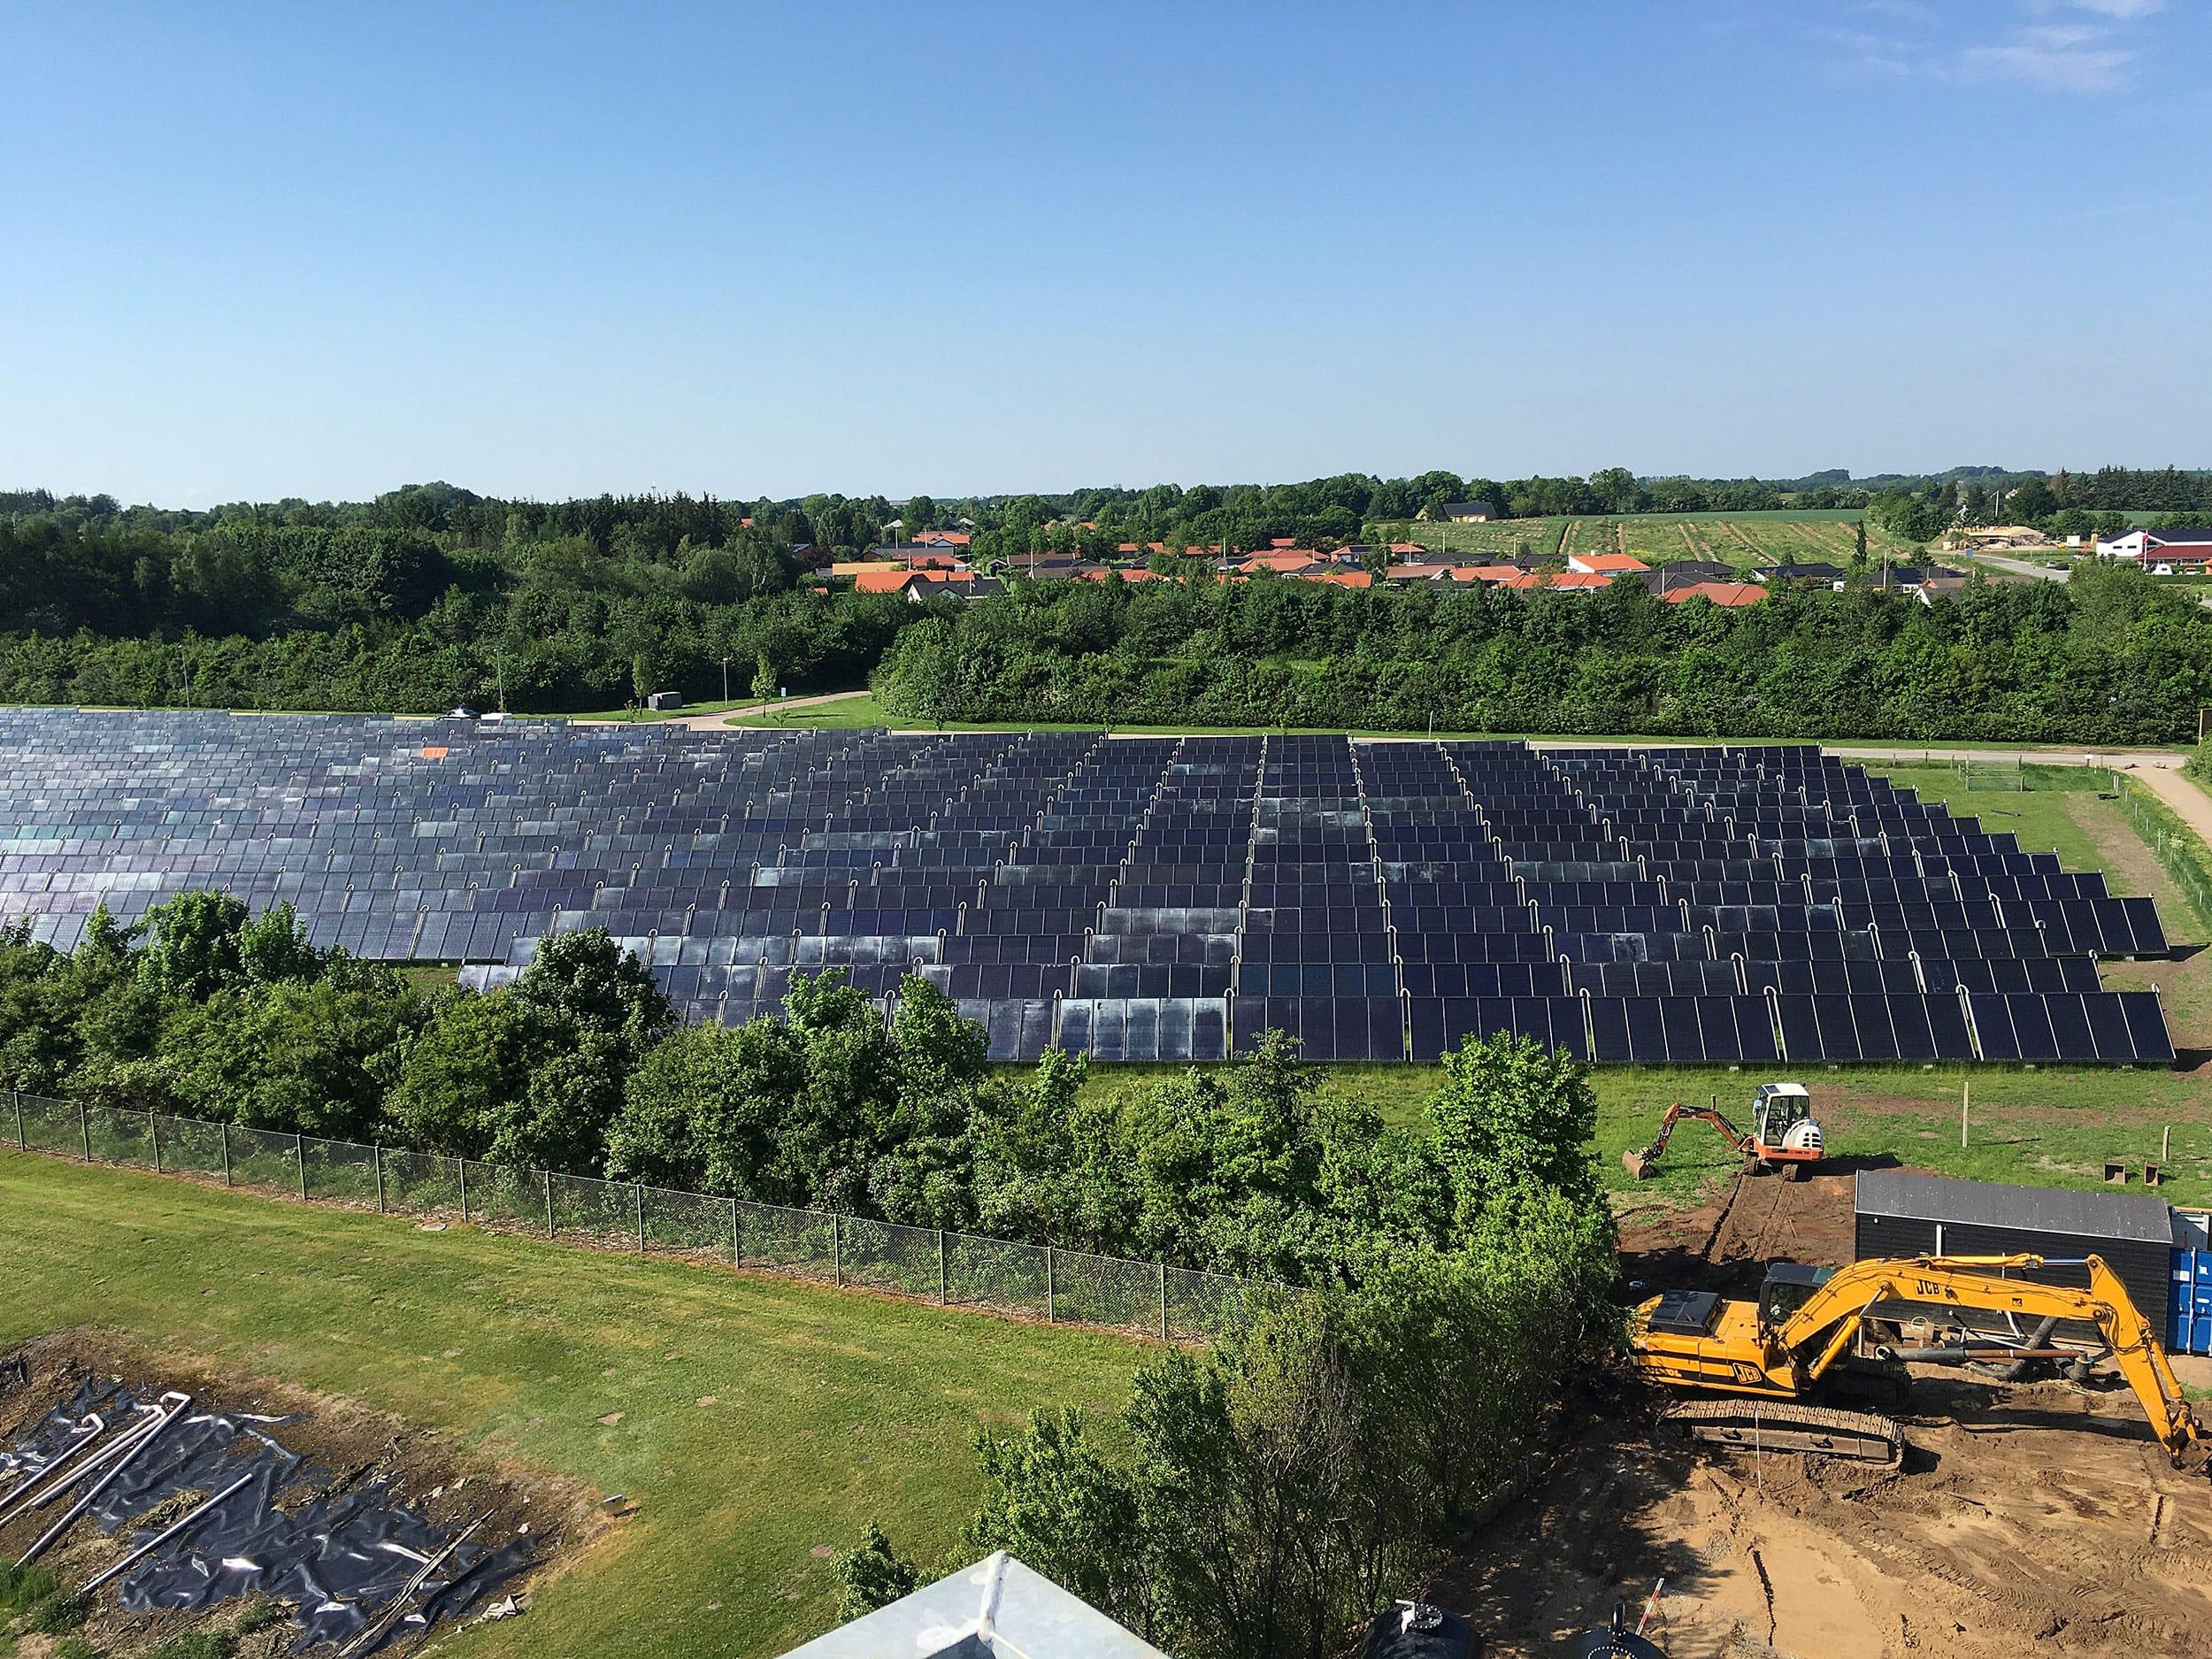 Eksisterende-solvarmeanlæg-på-7.800-m²